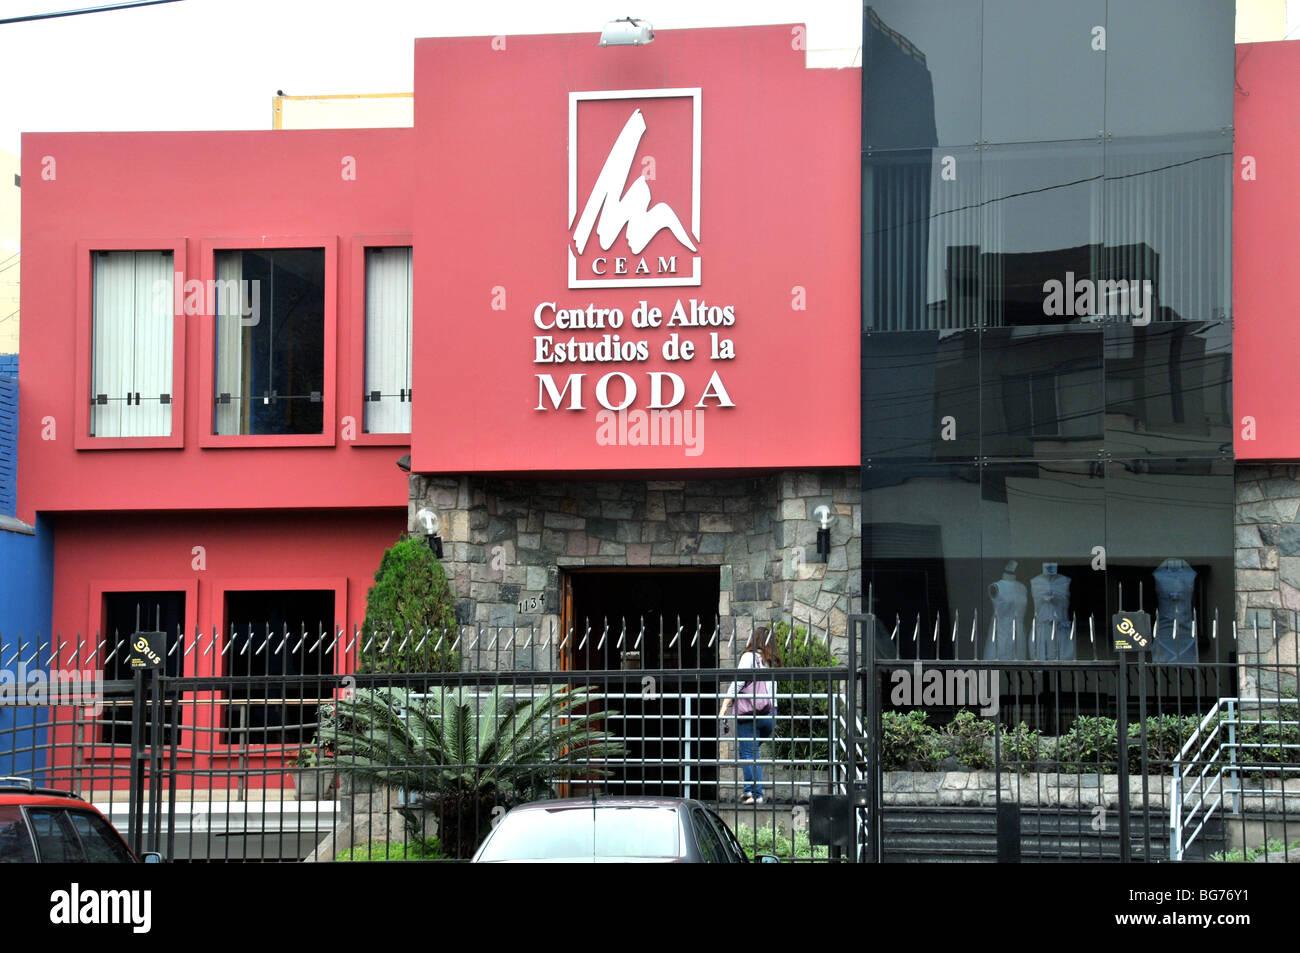 Centro de Altos Estudios de la Moda, Miraflores, Lima, Perú. Imagen De Stock